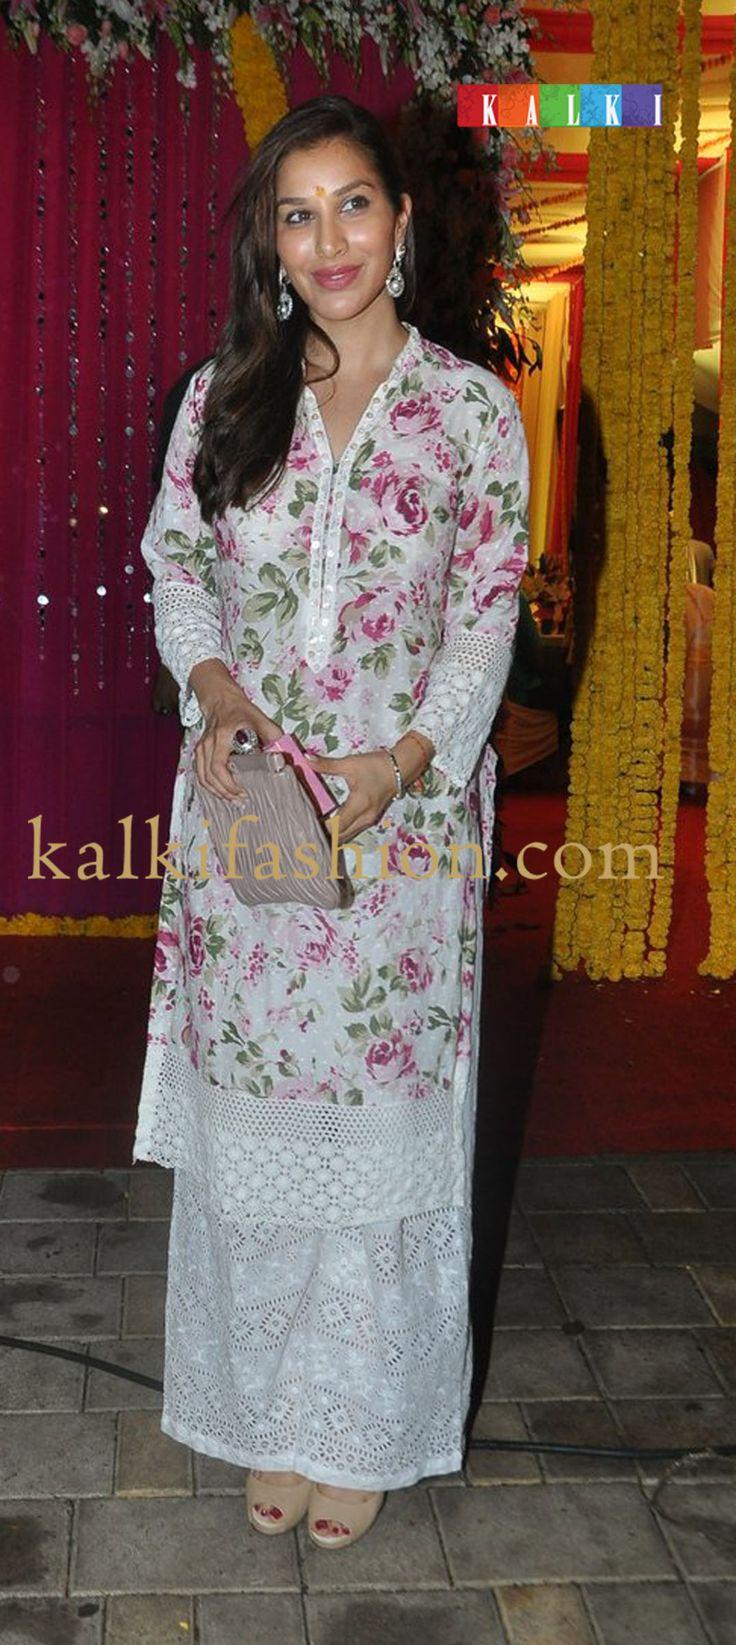 http://www.kalkifashion.com/   Sophia Chaudhry in white floral kurta with pants for Ganpati Visarjan at Salman Khan's residence.